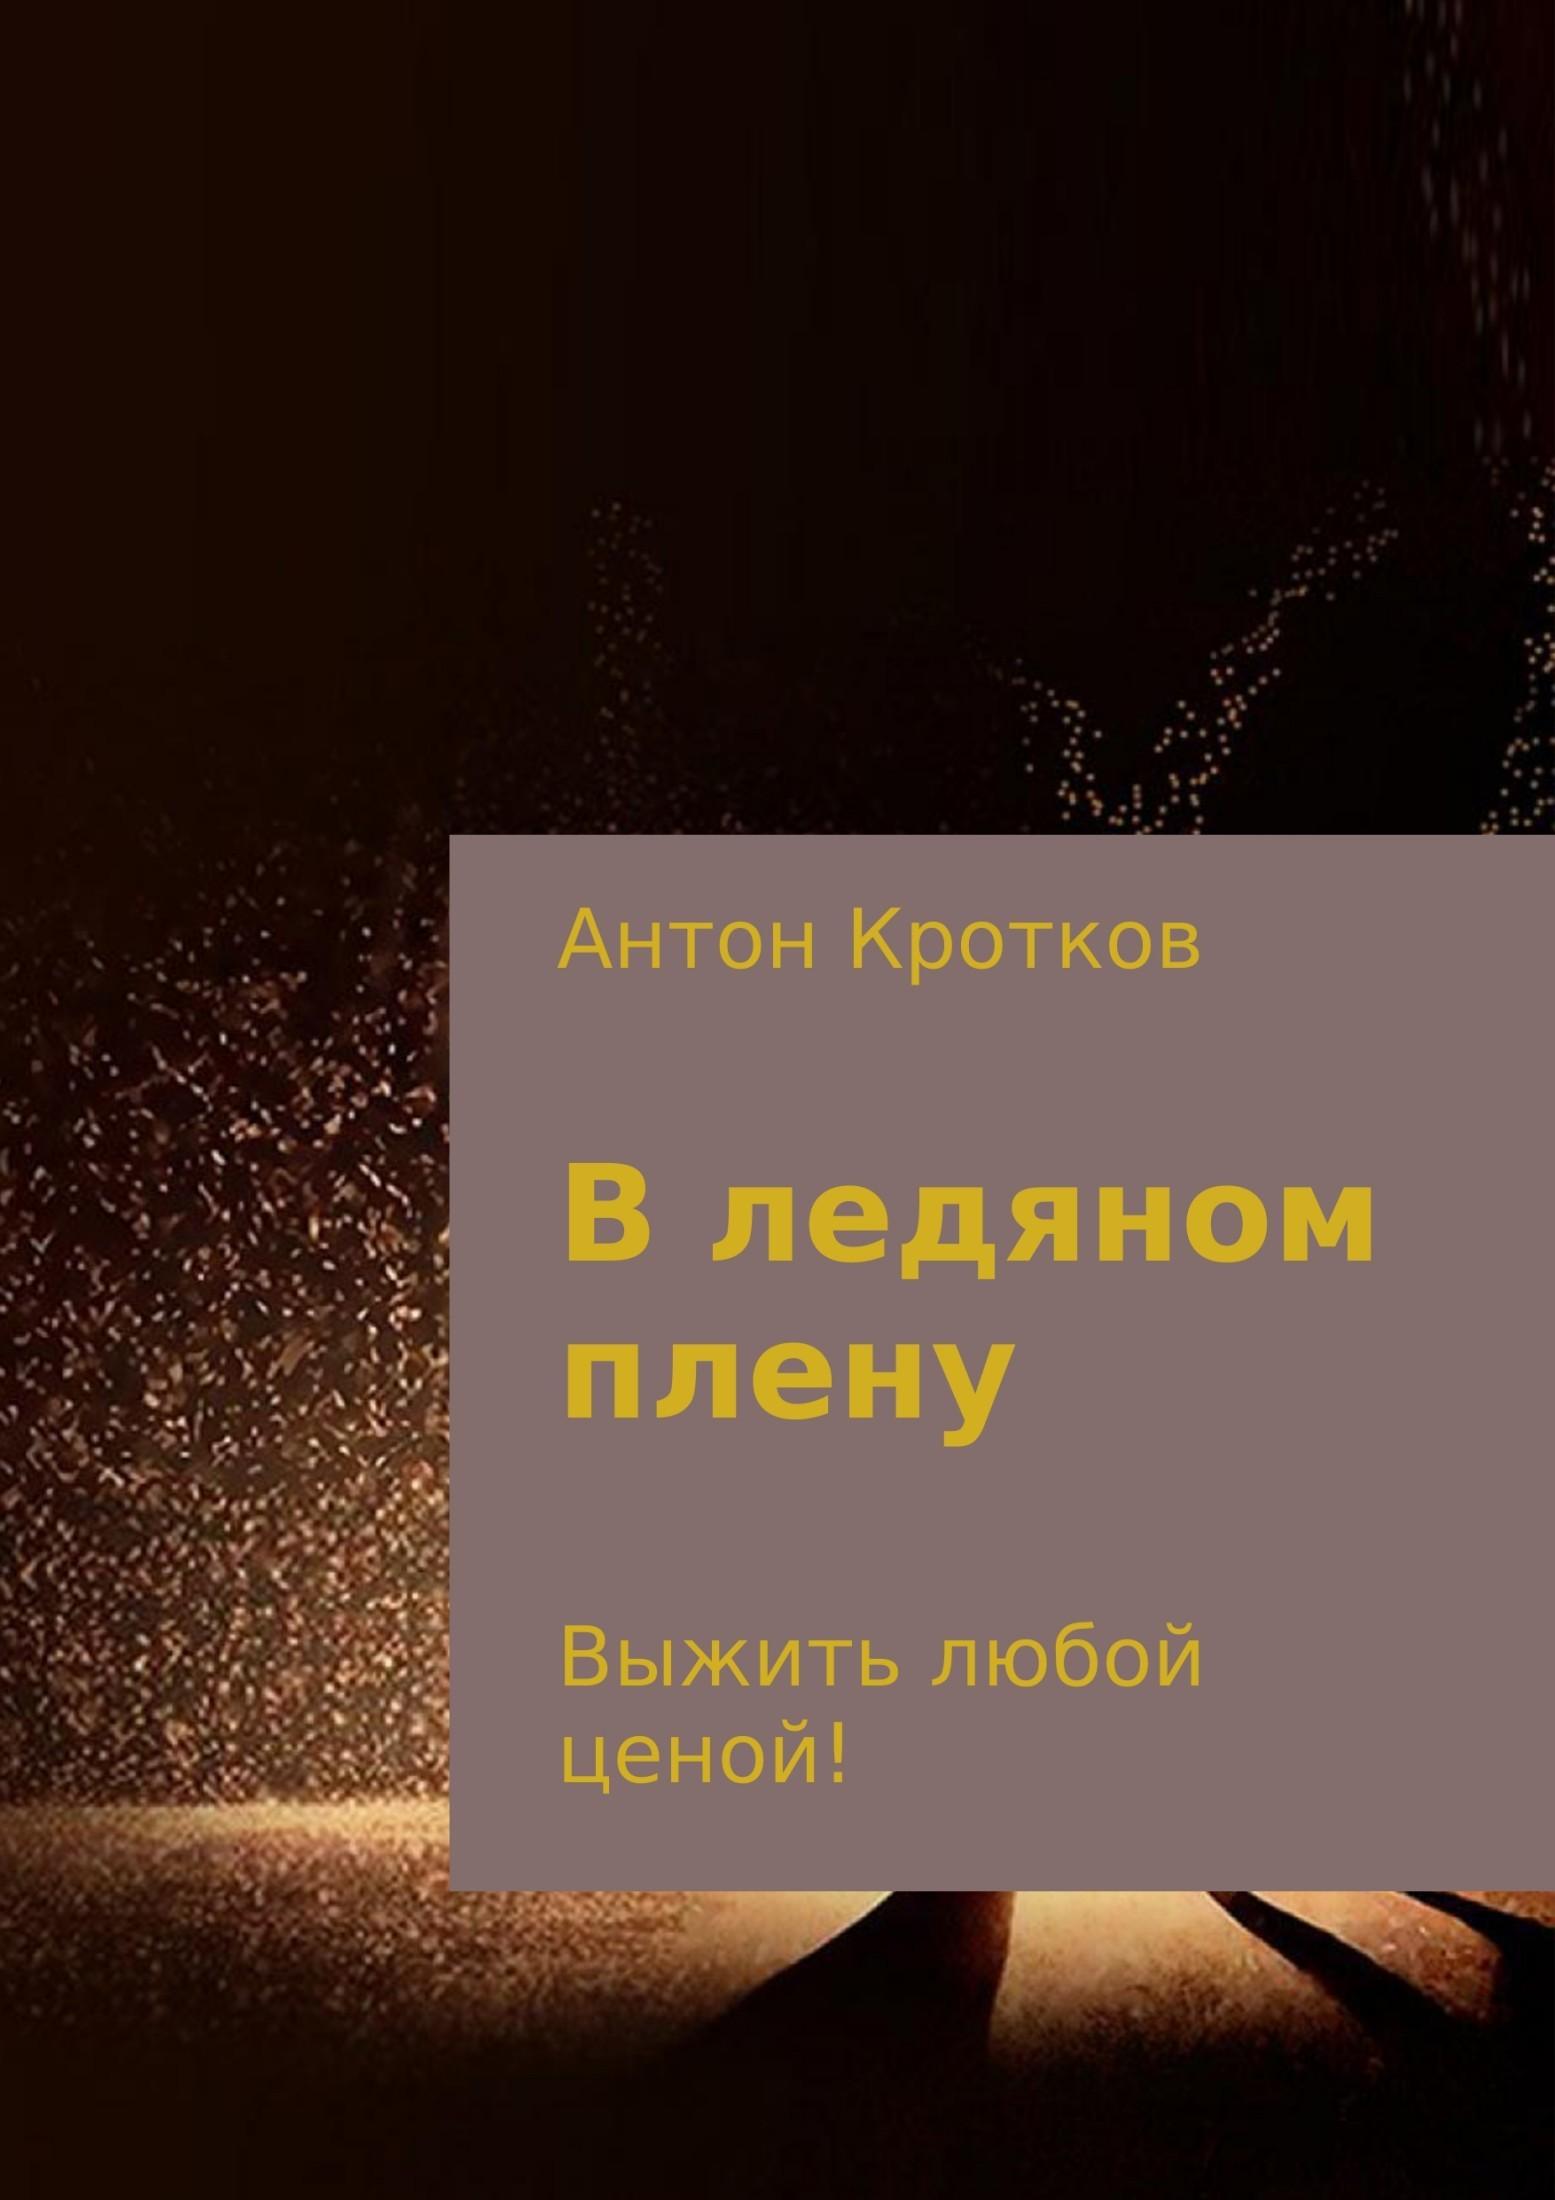 Антон Кротков - В ледяном плену